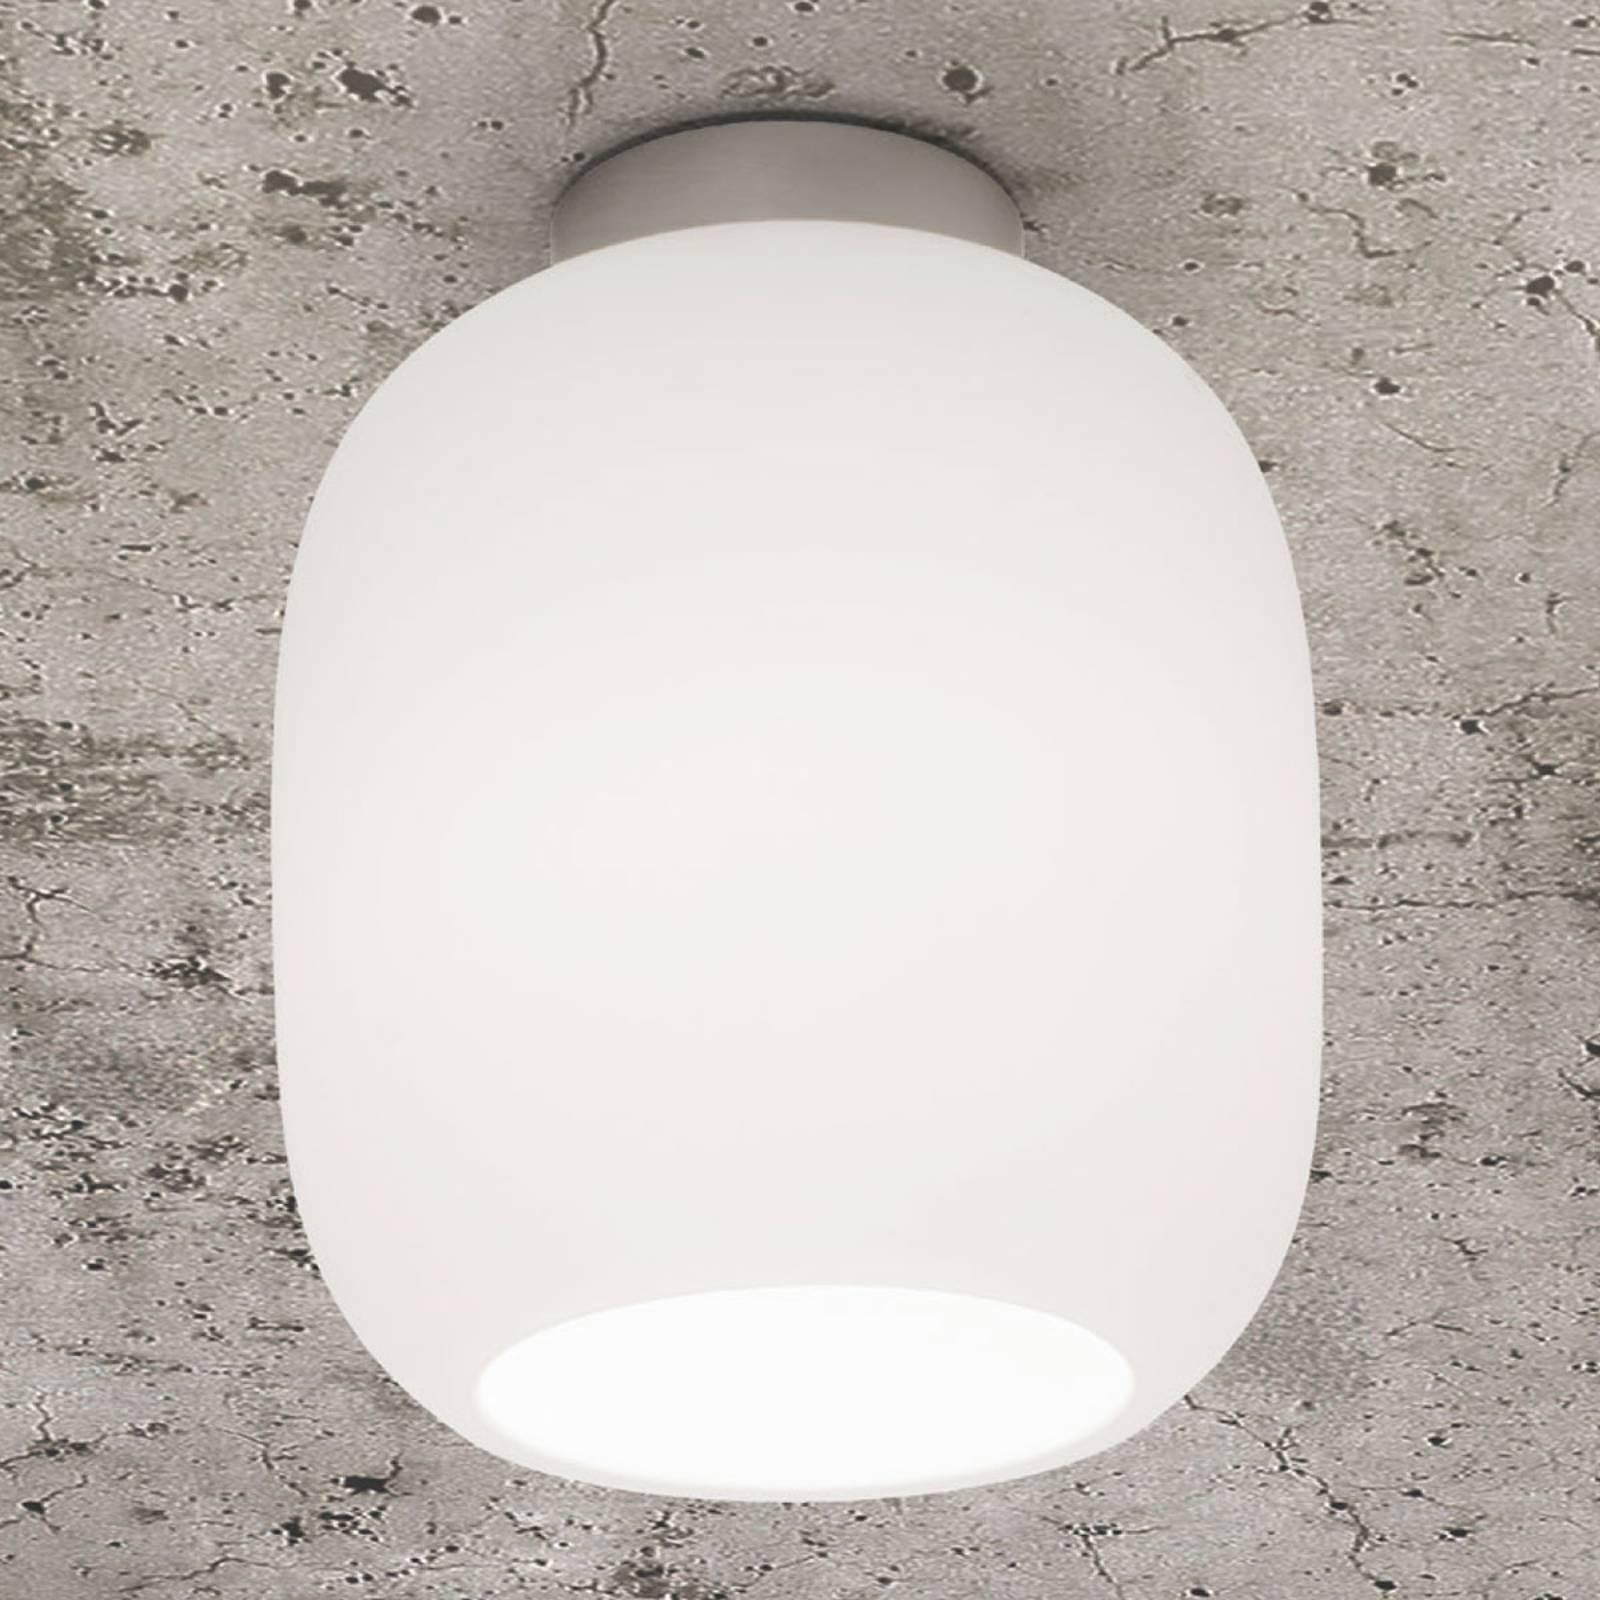 Casablanca Murea lampa sufitowa, opalowa Ø 13 cm